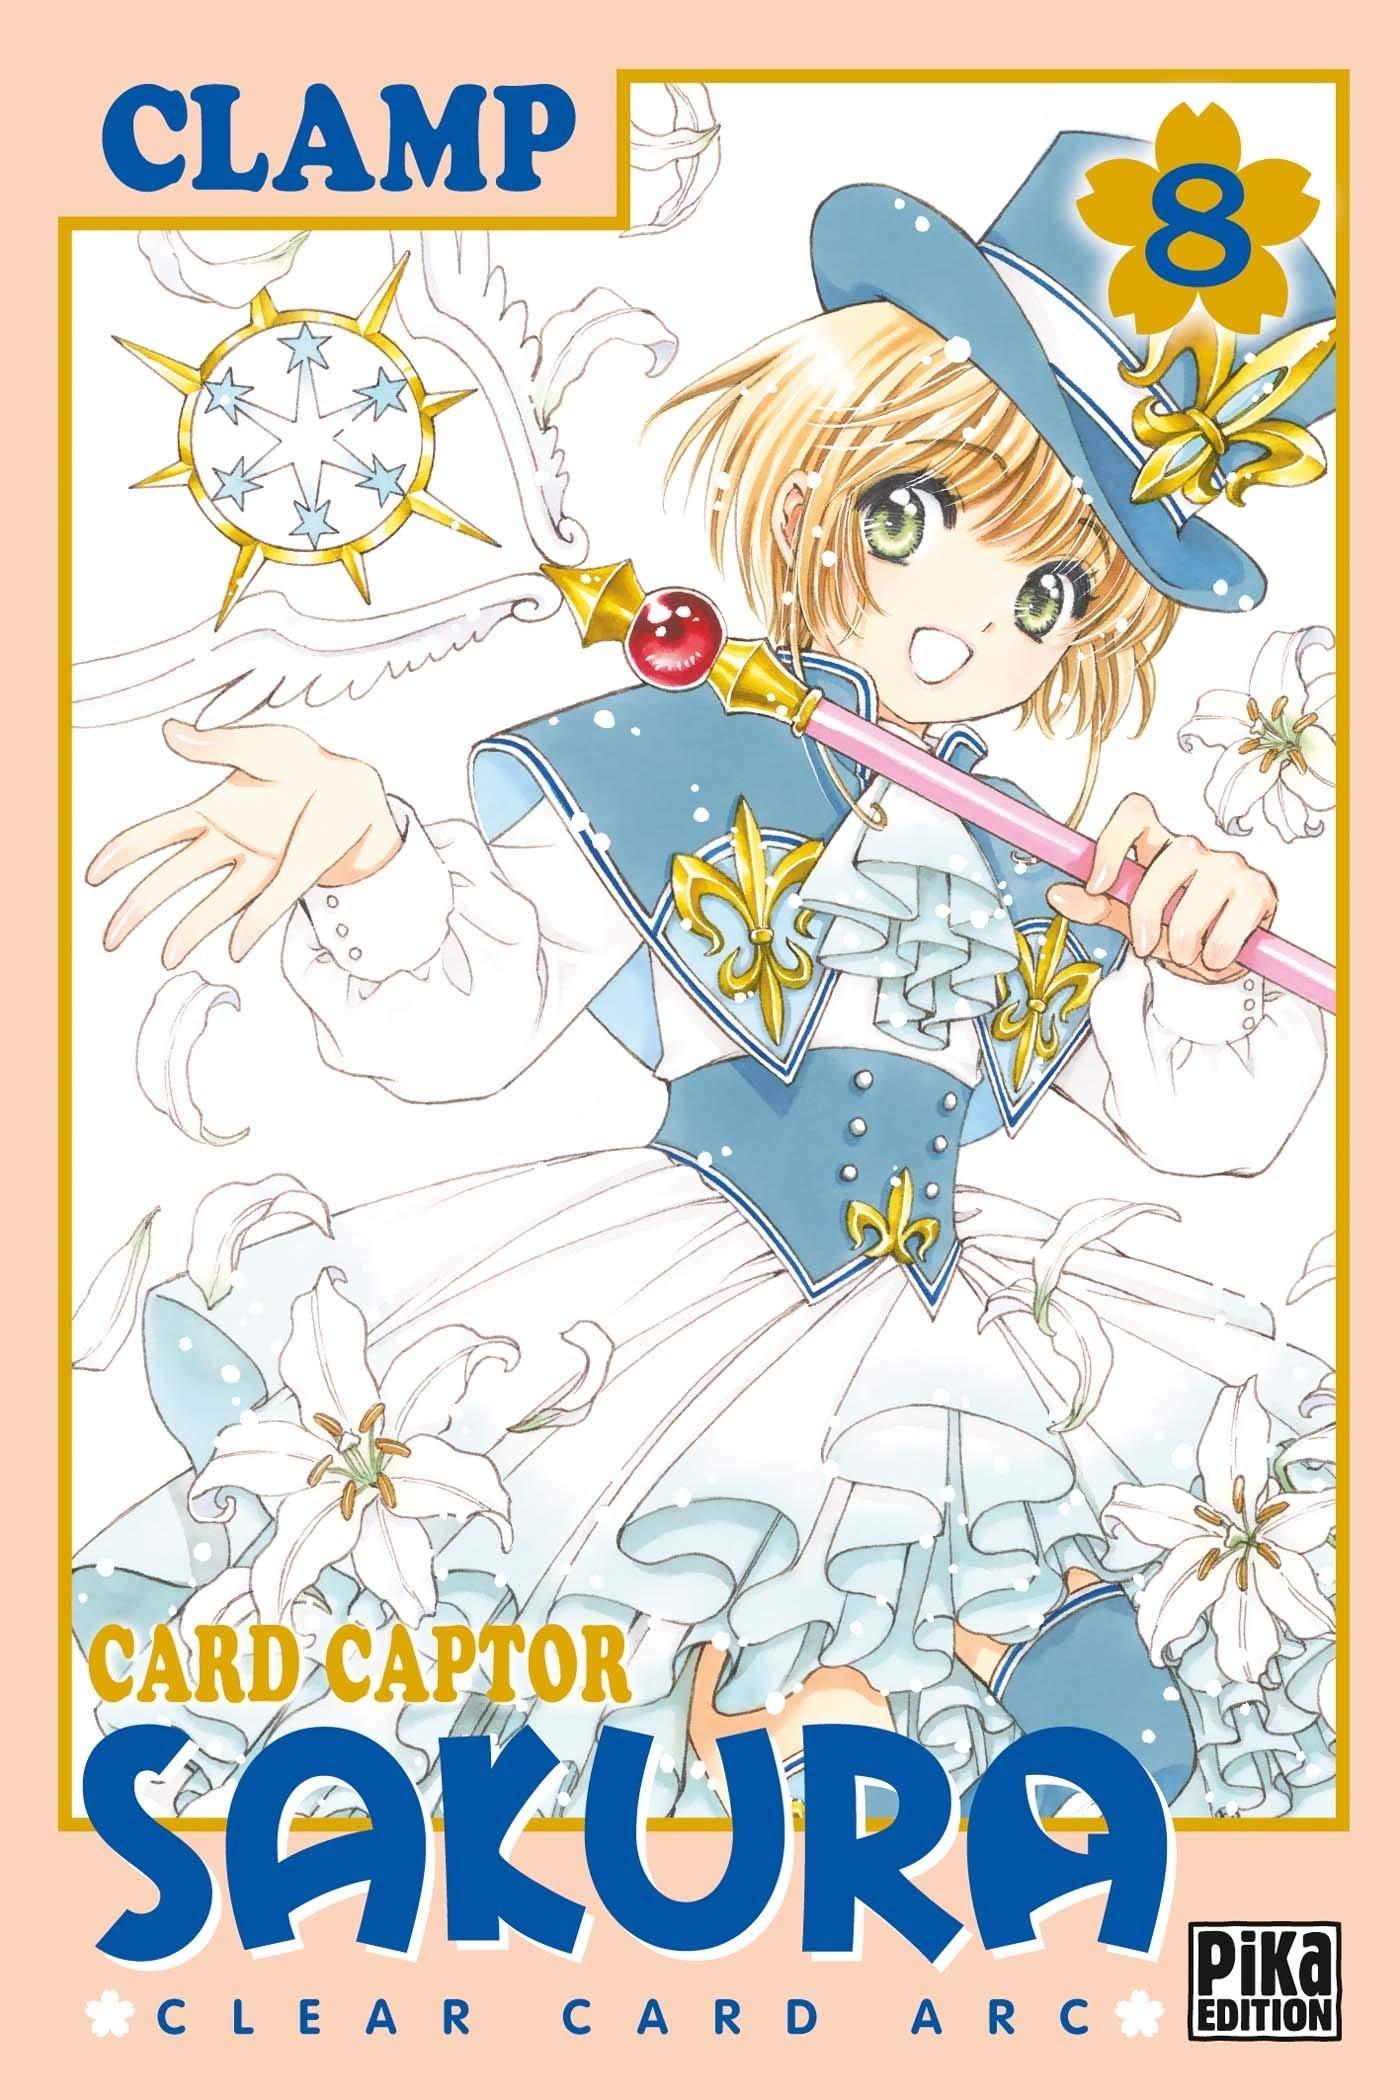 Card captor Sakura - Clear Card Arc 8